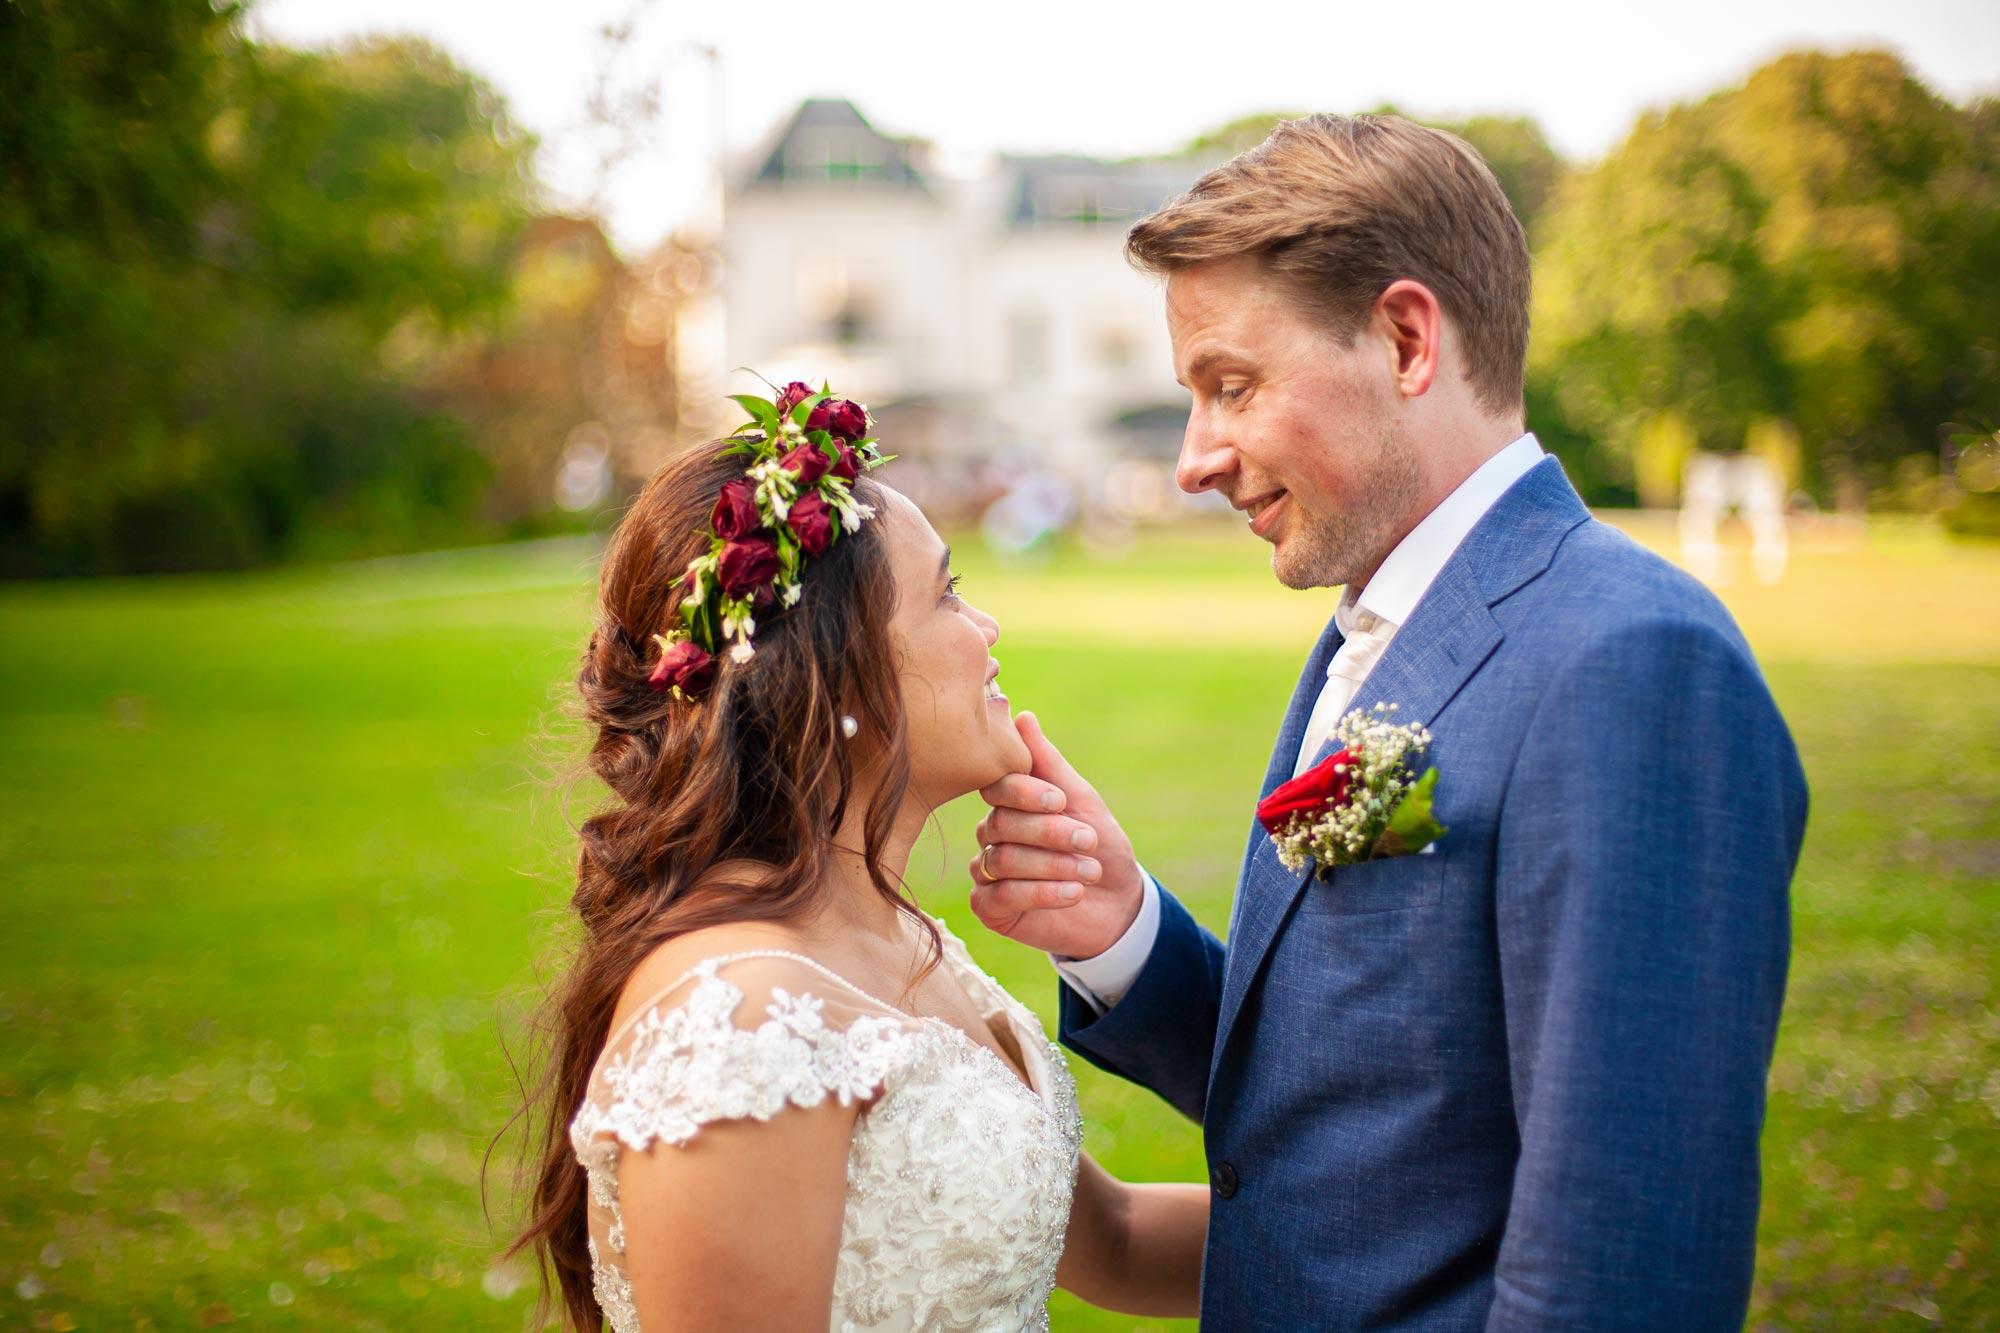 Bruidsfotograaf den haag landgoed te werve